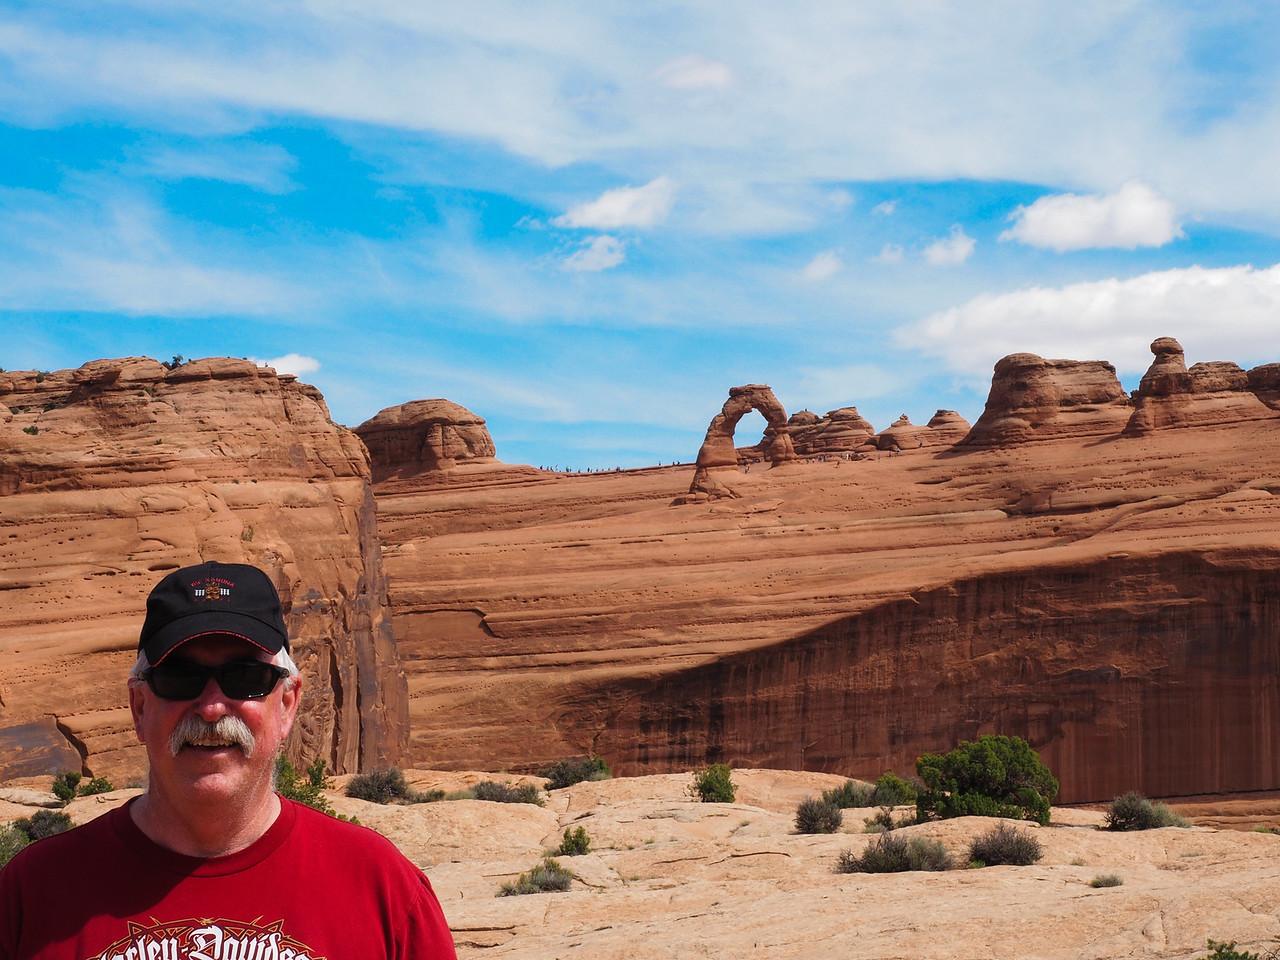 Vern Patterson Memorial Ride